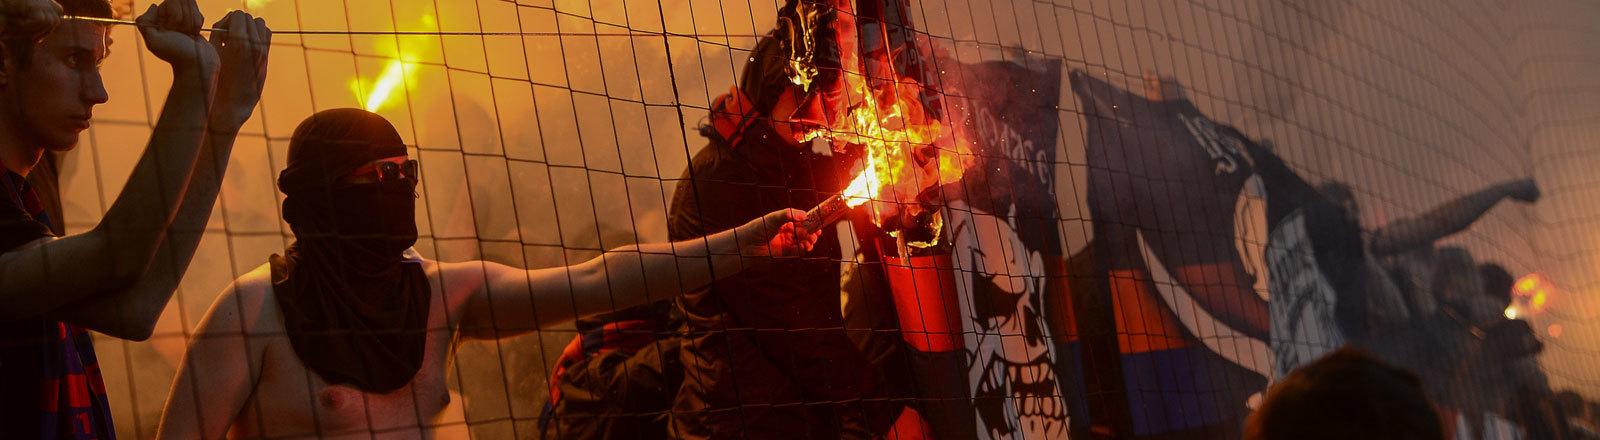 CSKA Fans verbrennen am 30.04.2017 Spartak Flagge während dem Spiel CSKA Moskau gegen Spartak Moskau.